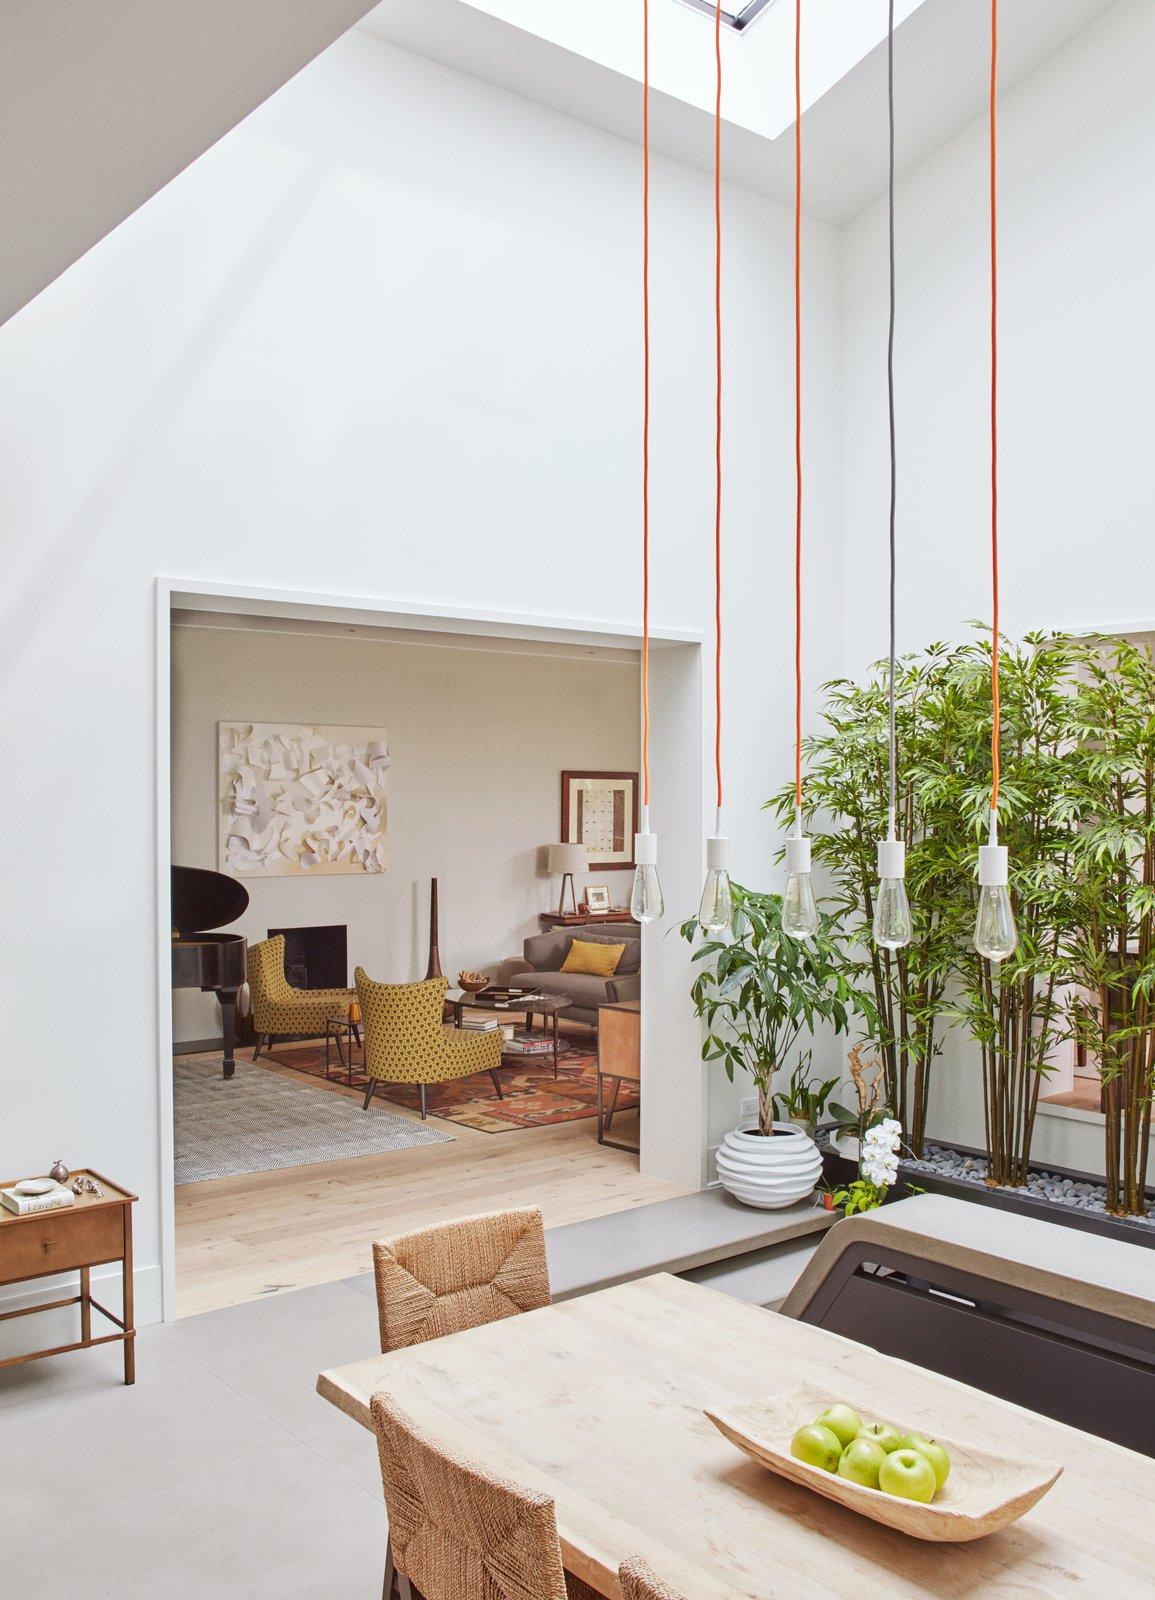 #soco #pendantlights #techlighting #lighting #interior #modern #cordlights #diningroom #livingroom #naturallighting #woodtable    60+ Modern Lighting Solutions by Dwell